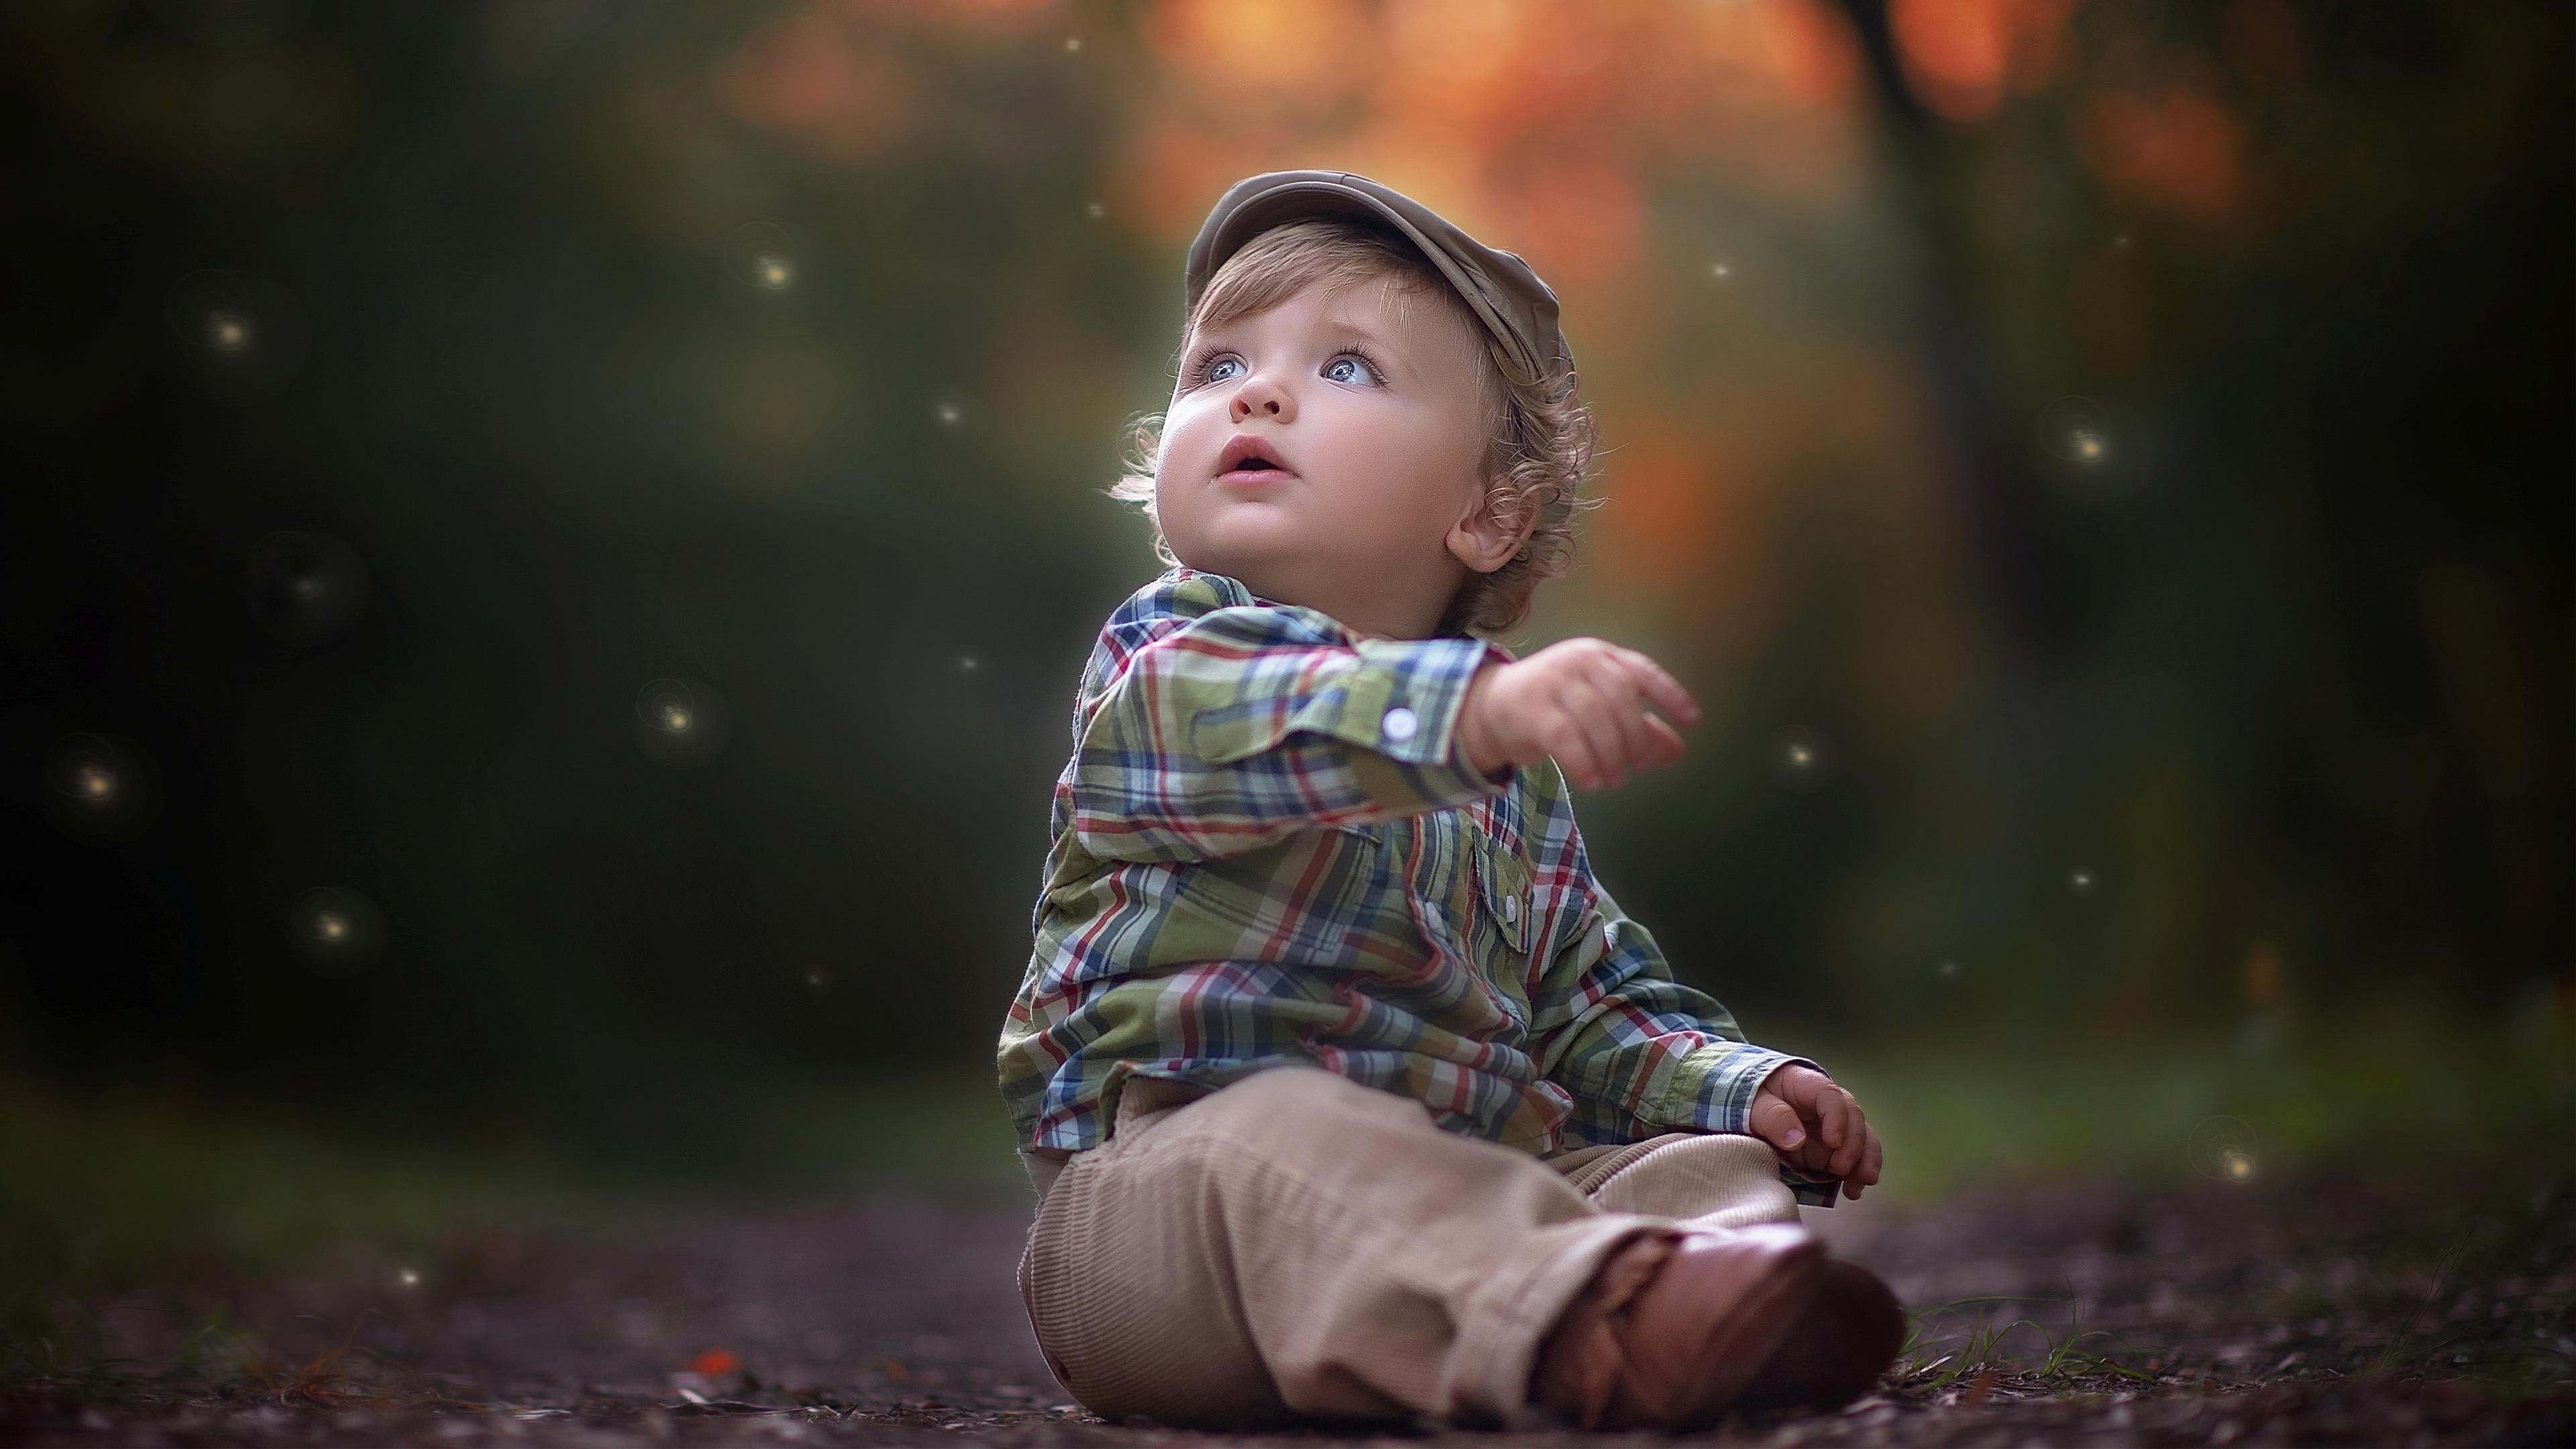 cute little boy wallpapers in jpg format for free download